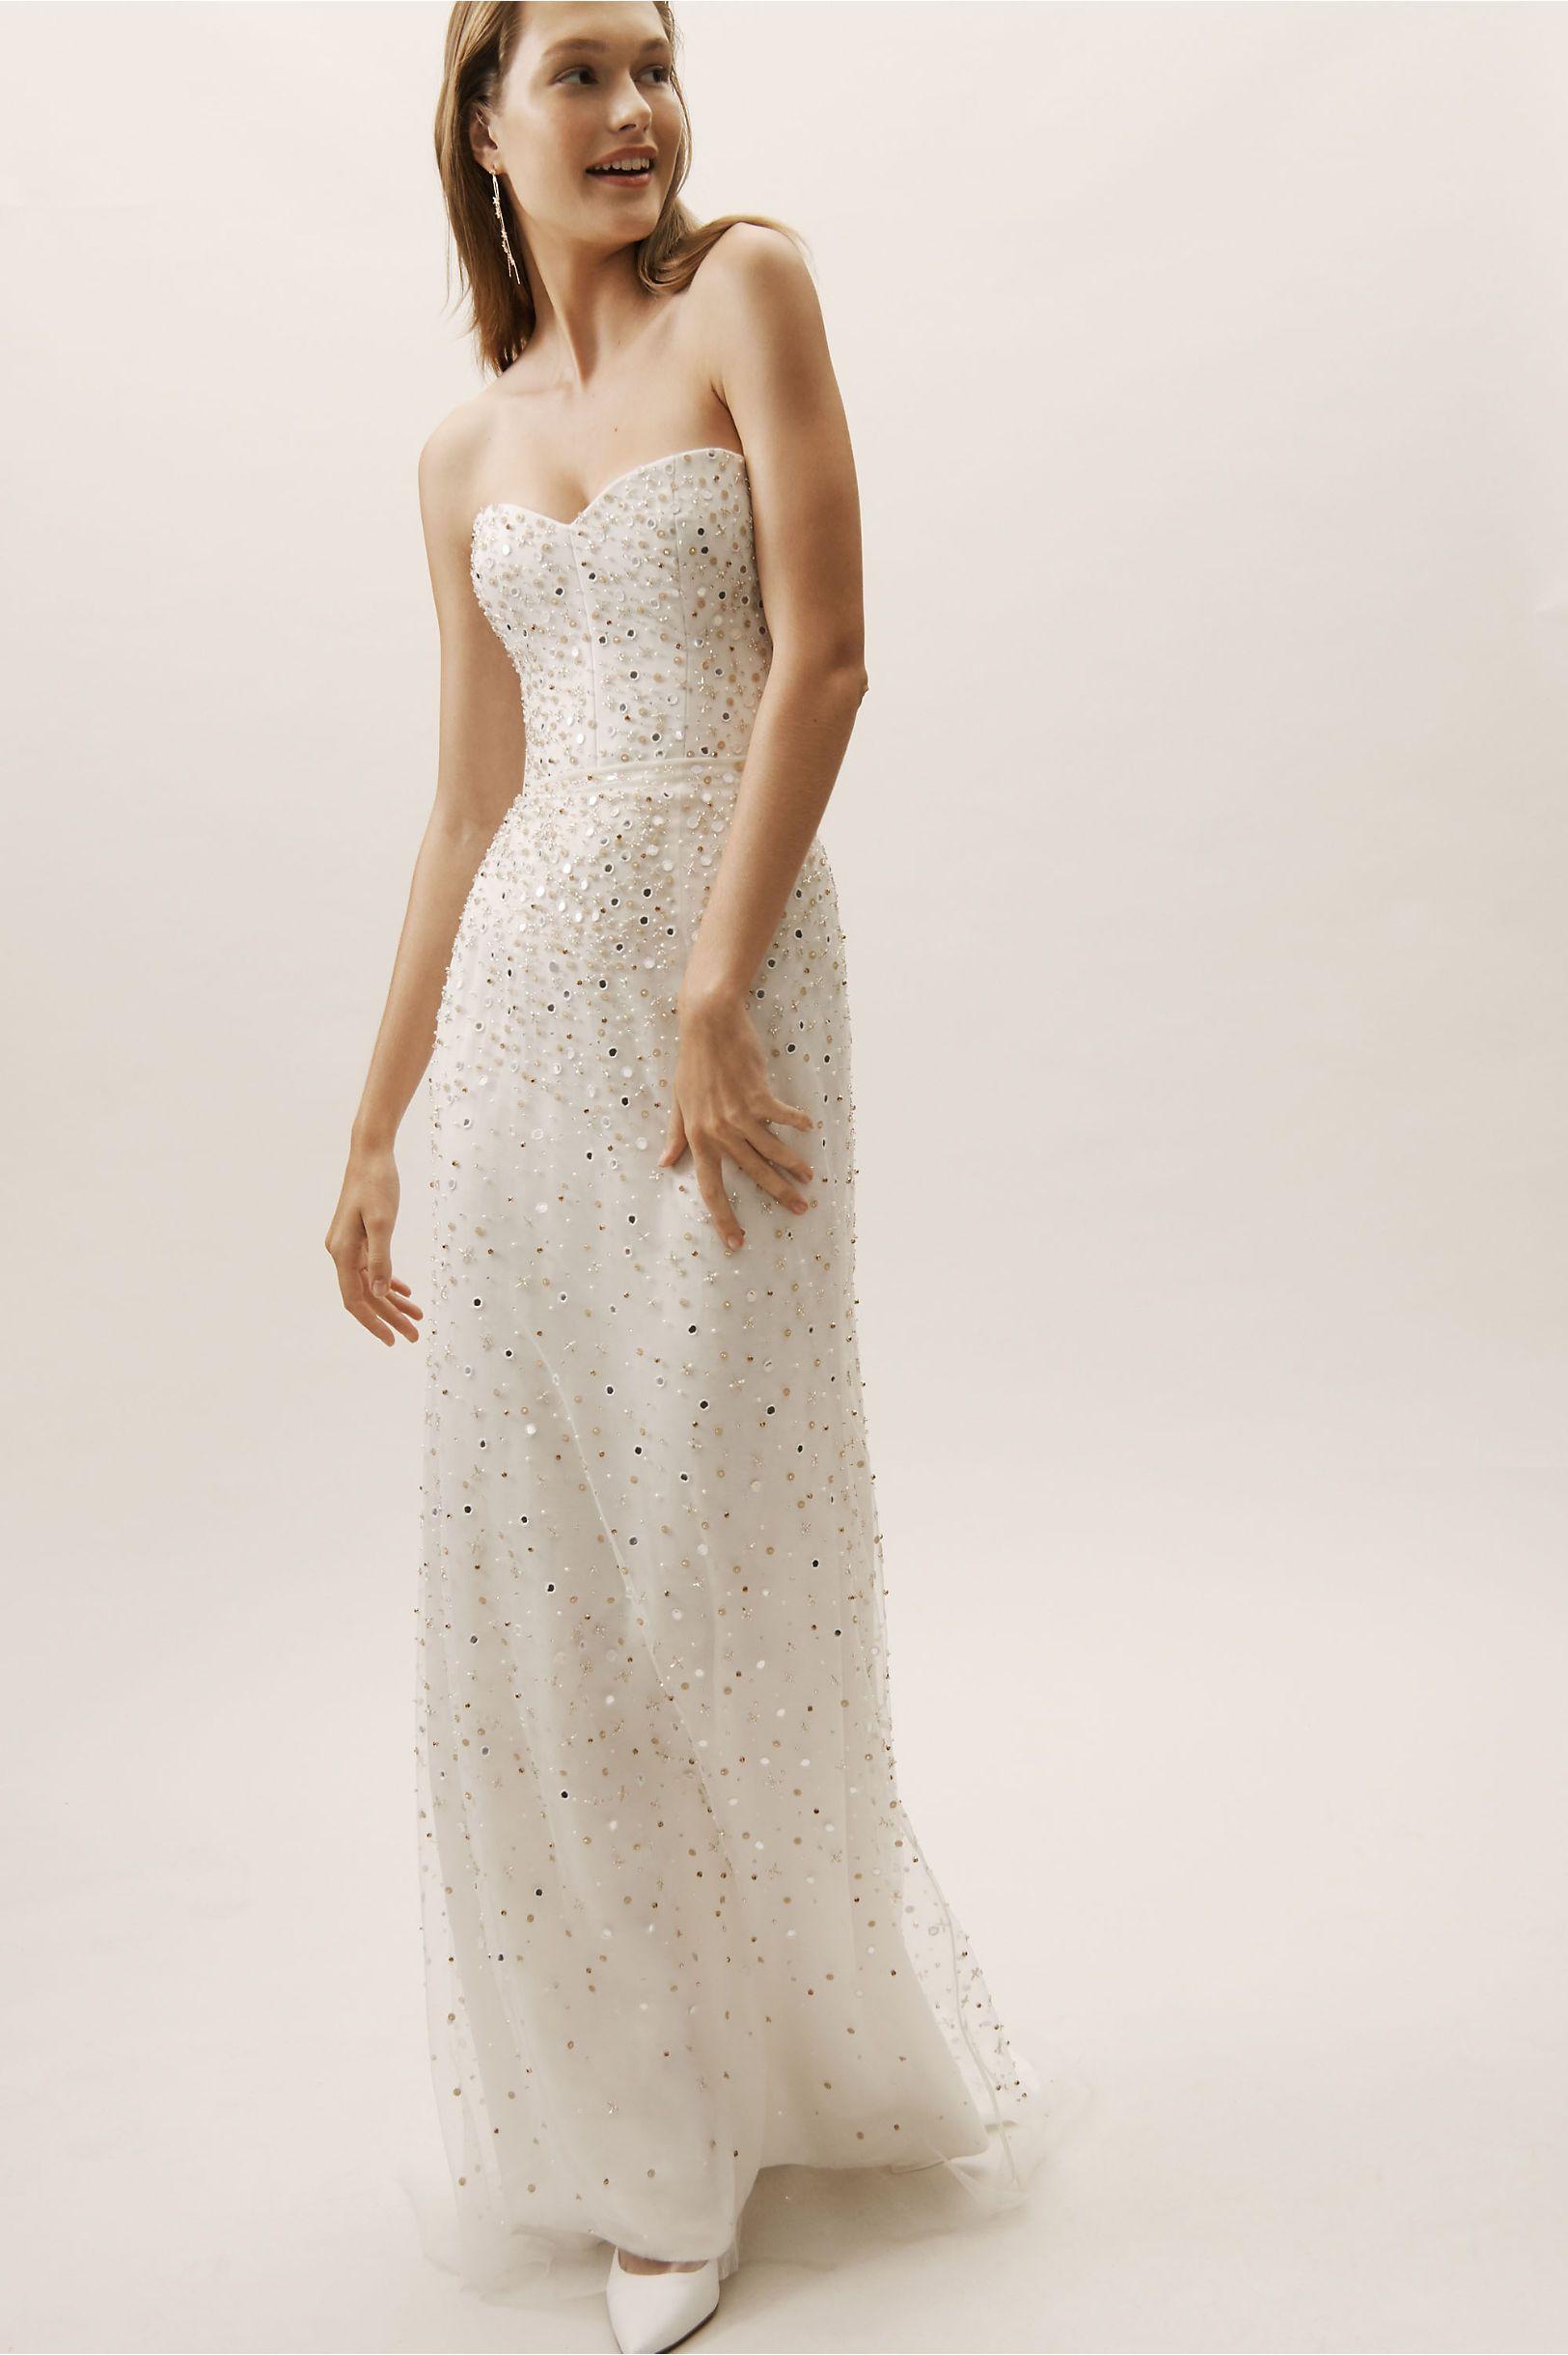 Houston Gown Sparkly Wedding Dress Wedding Dresses Houston Dresses